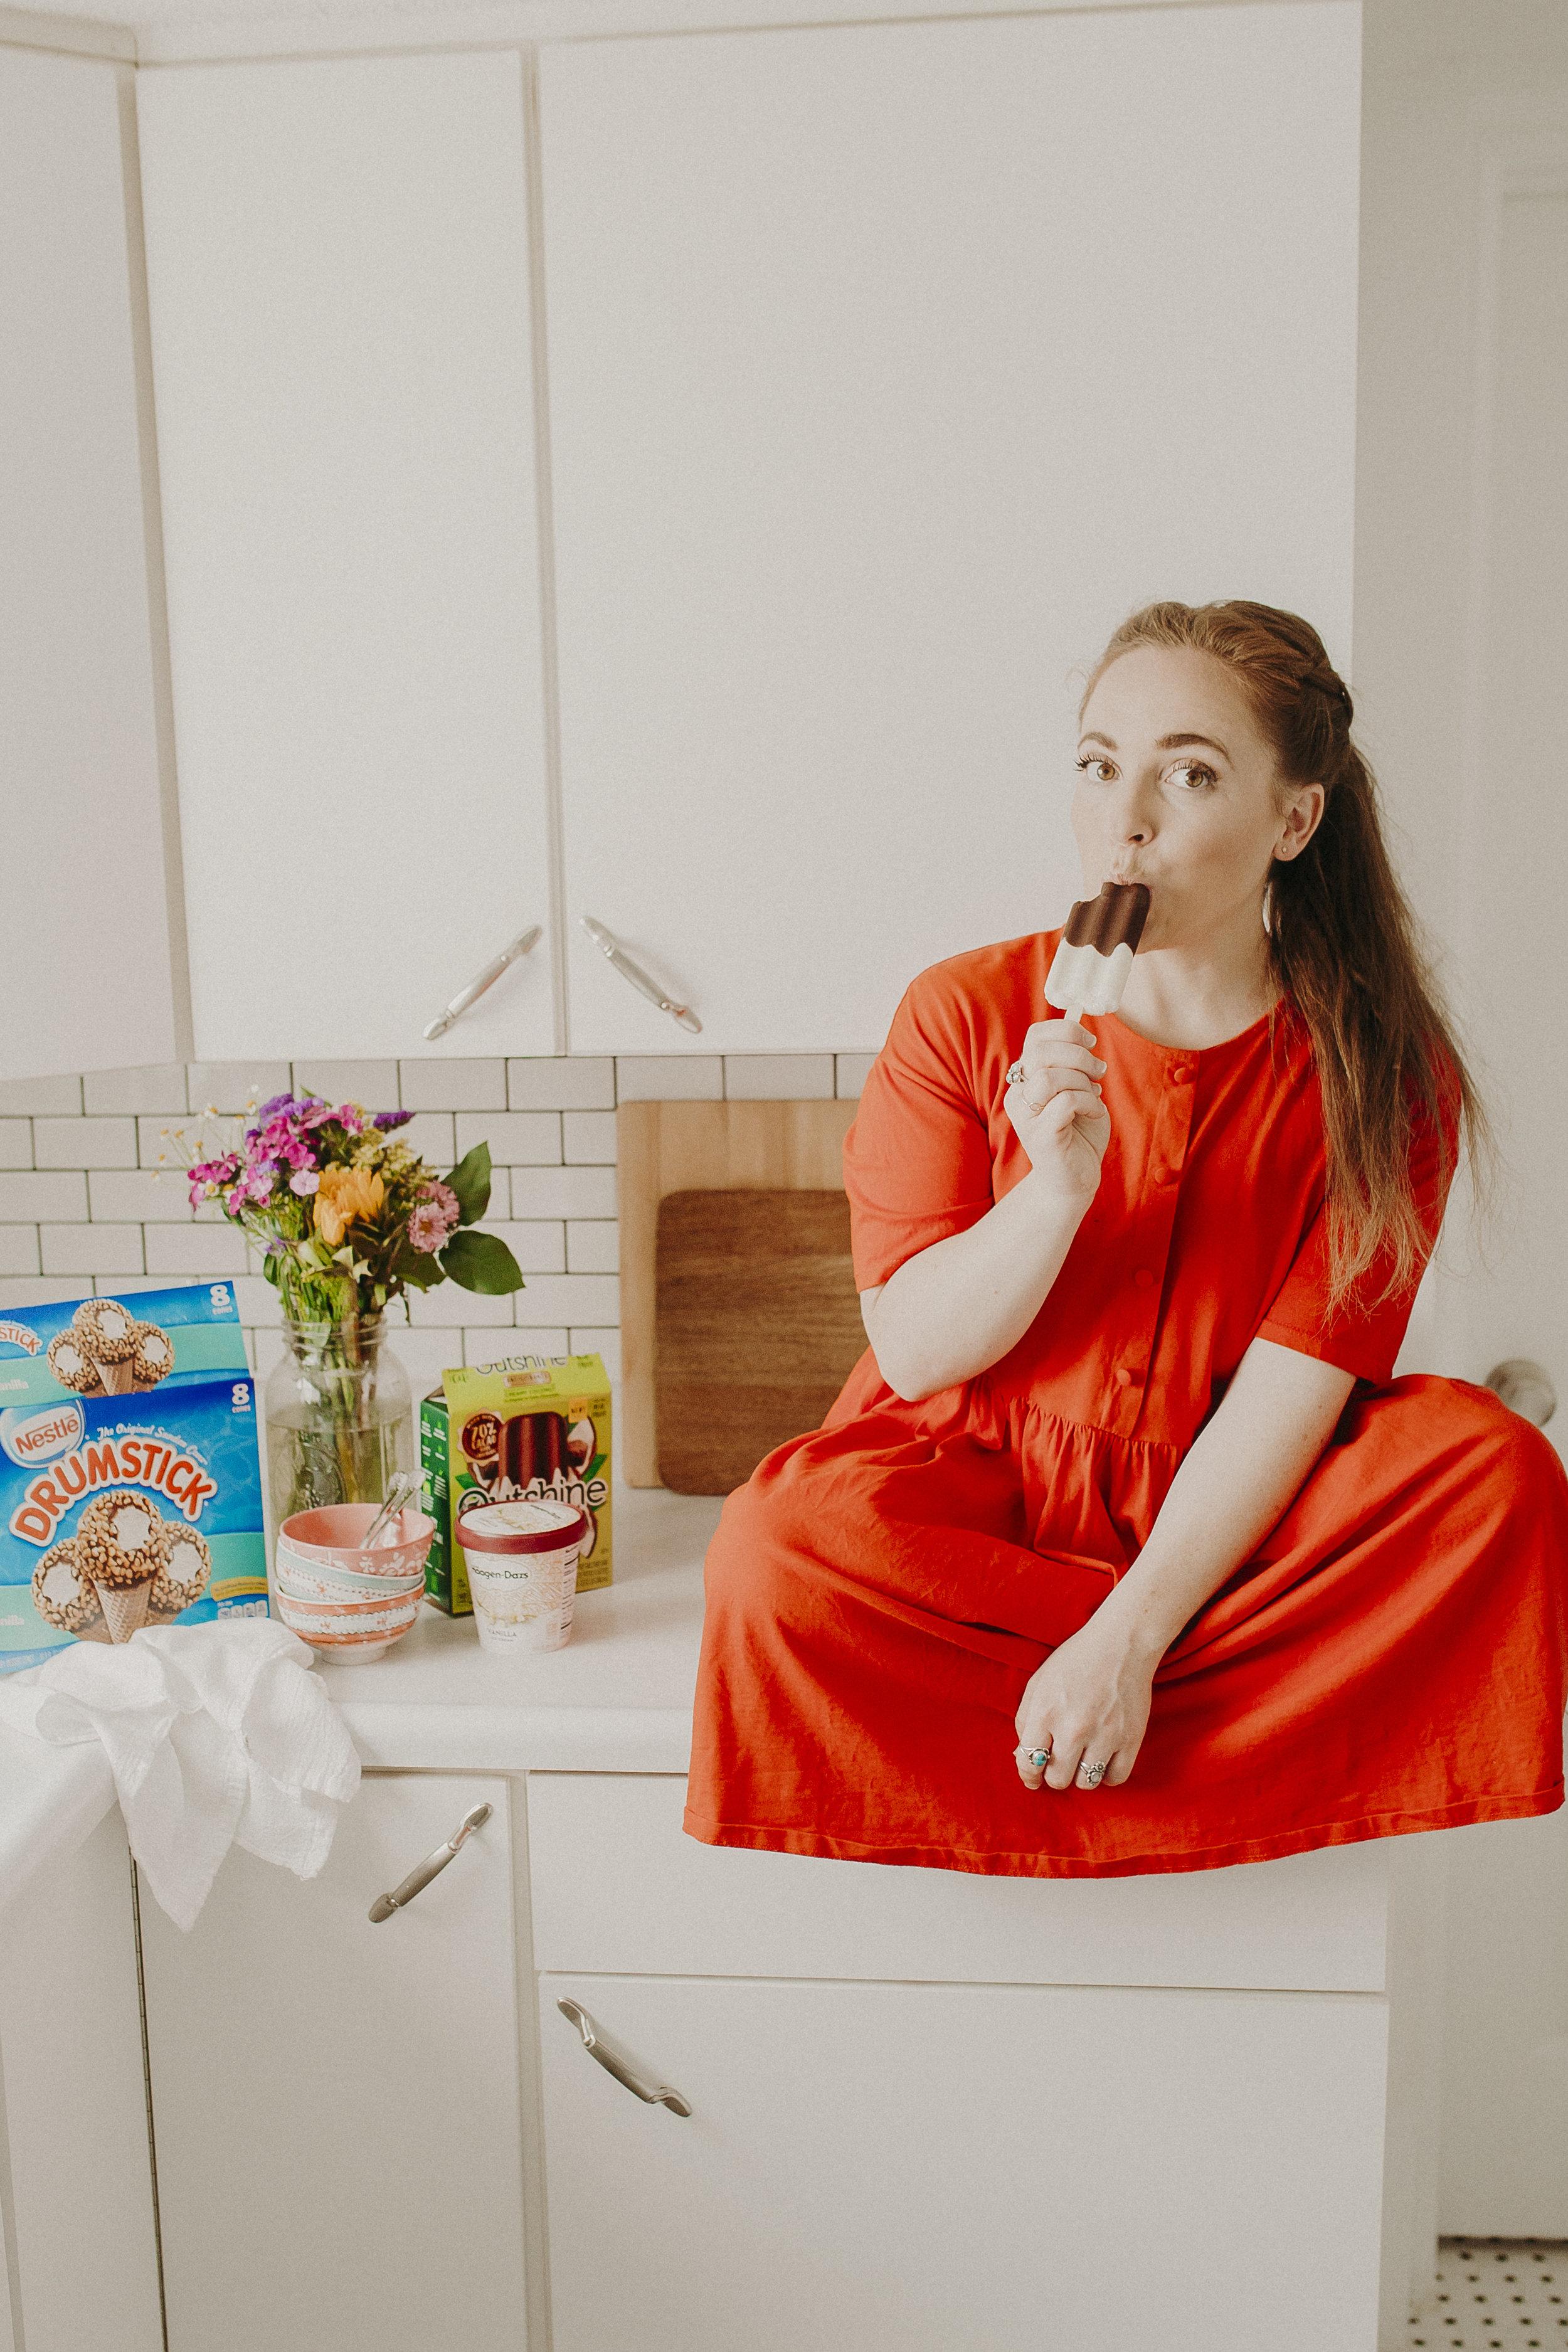 summer fun ice cream party ideas 2019-7.jpg